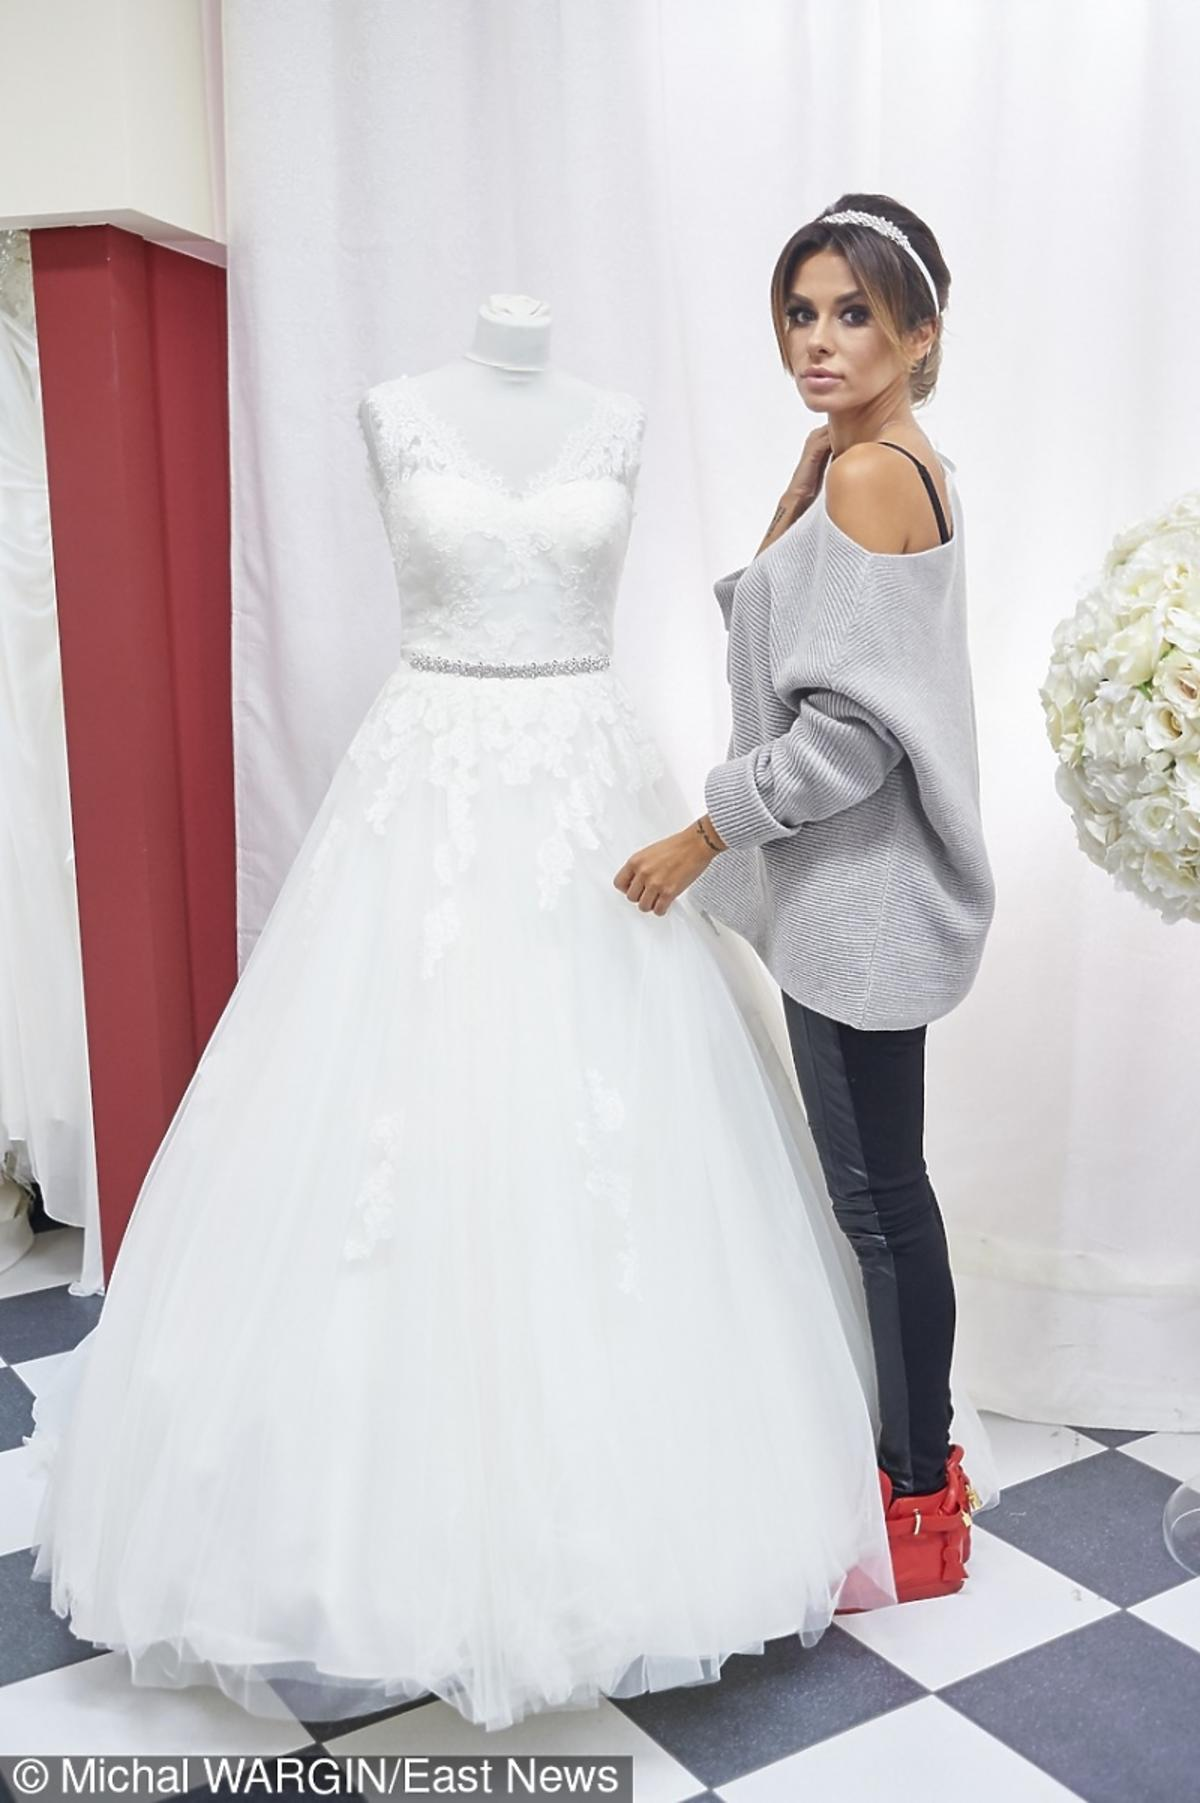 Natali Siwiec i sukienka ślubna